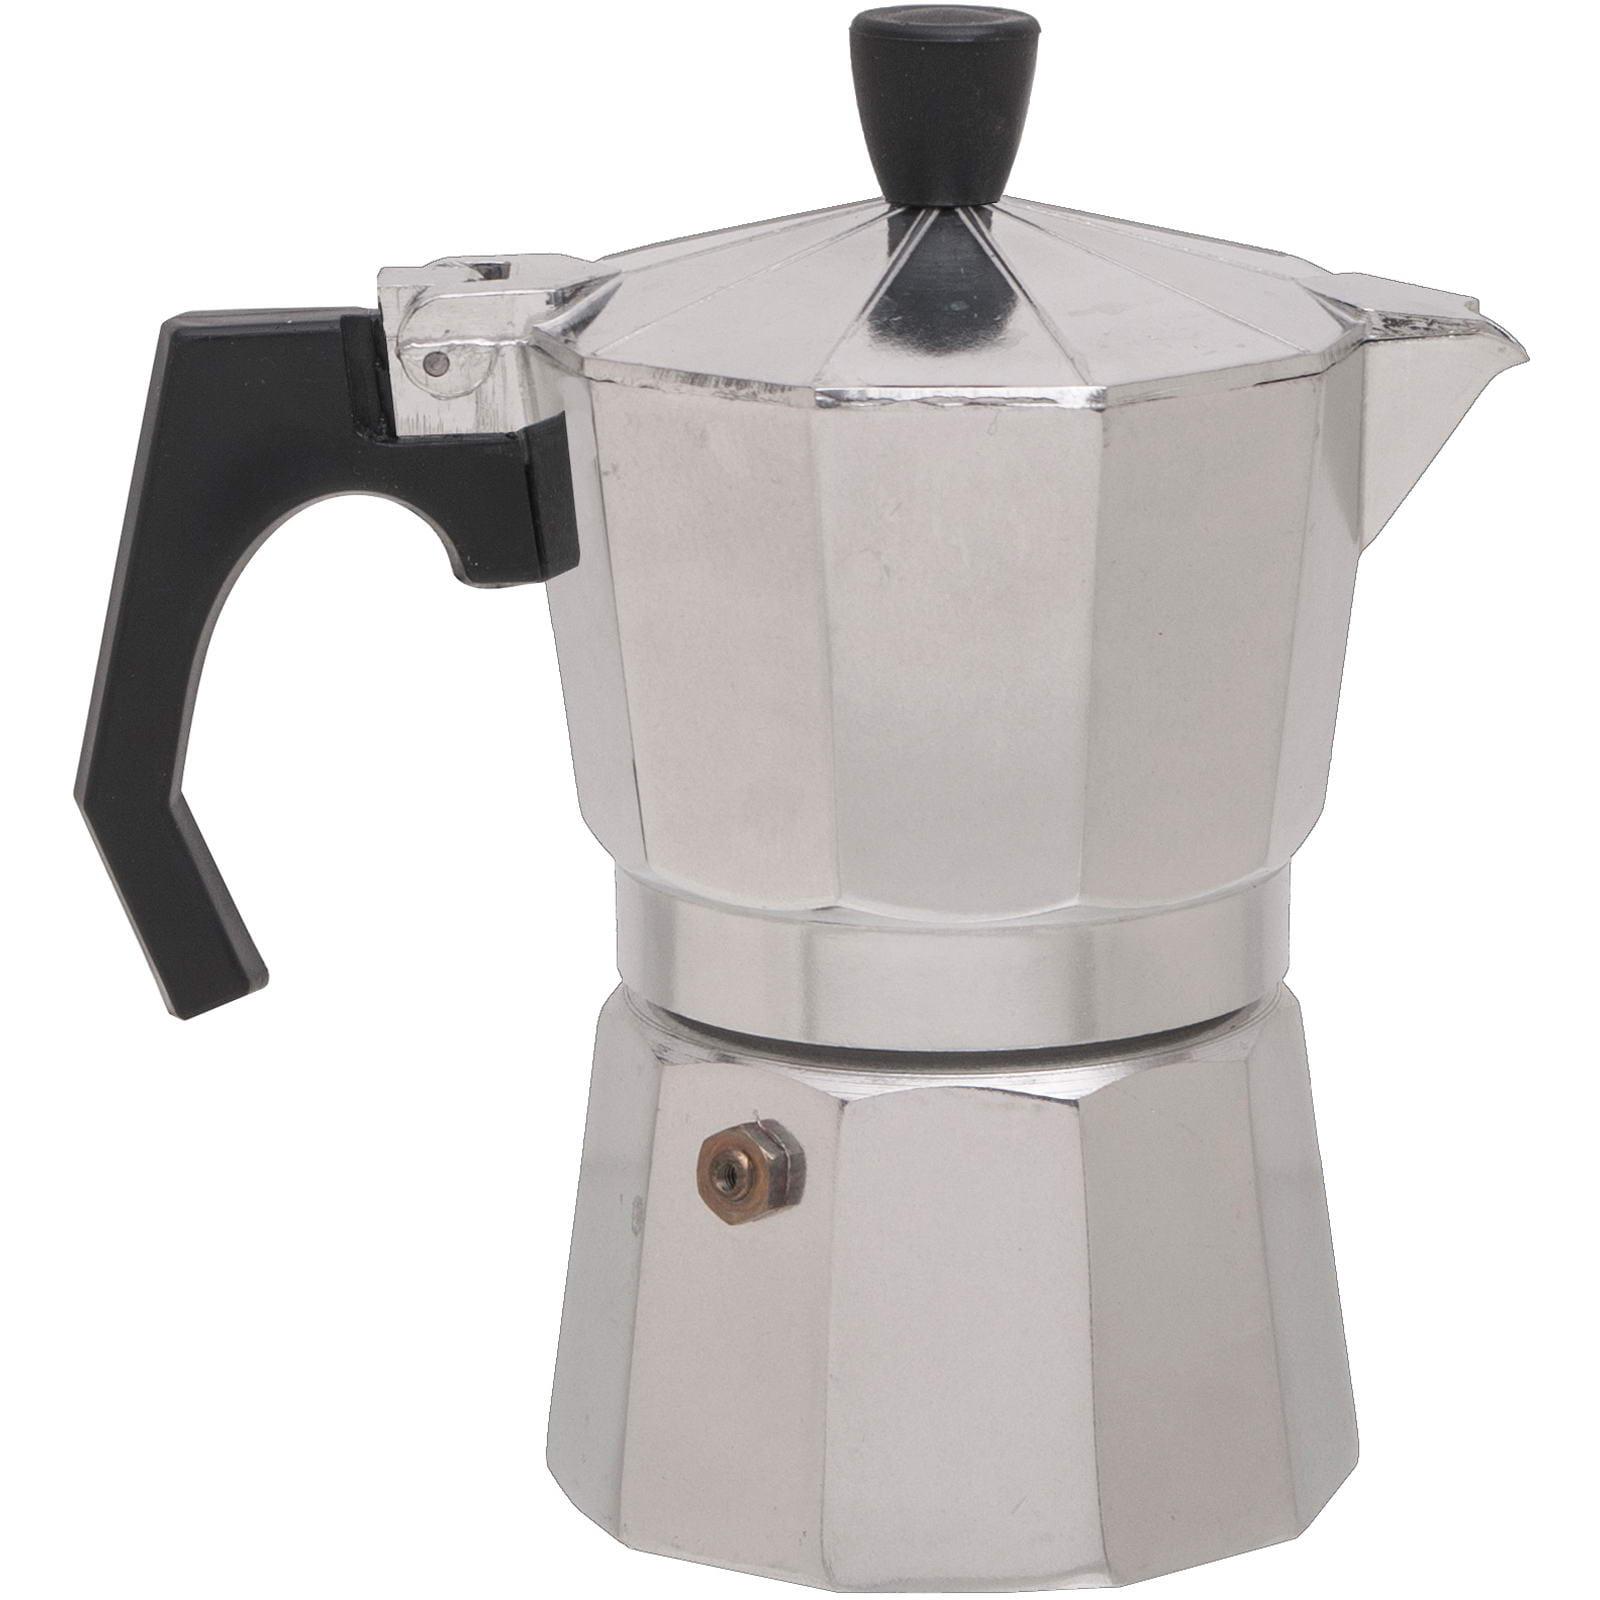 relags bellanapoli 3 tassen espresso maker g nstig online kaufen. Black Bedroom Furniture Sets. Home Design Ideas